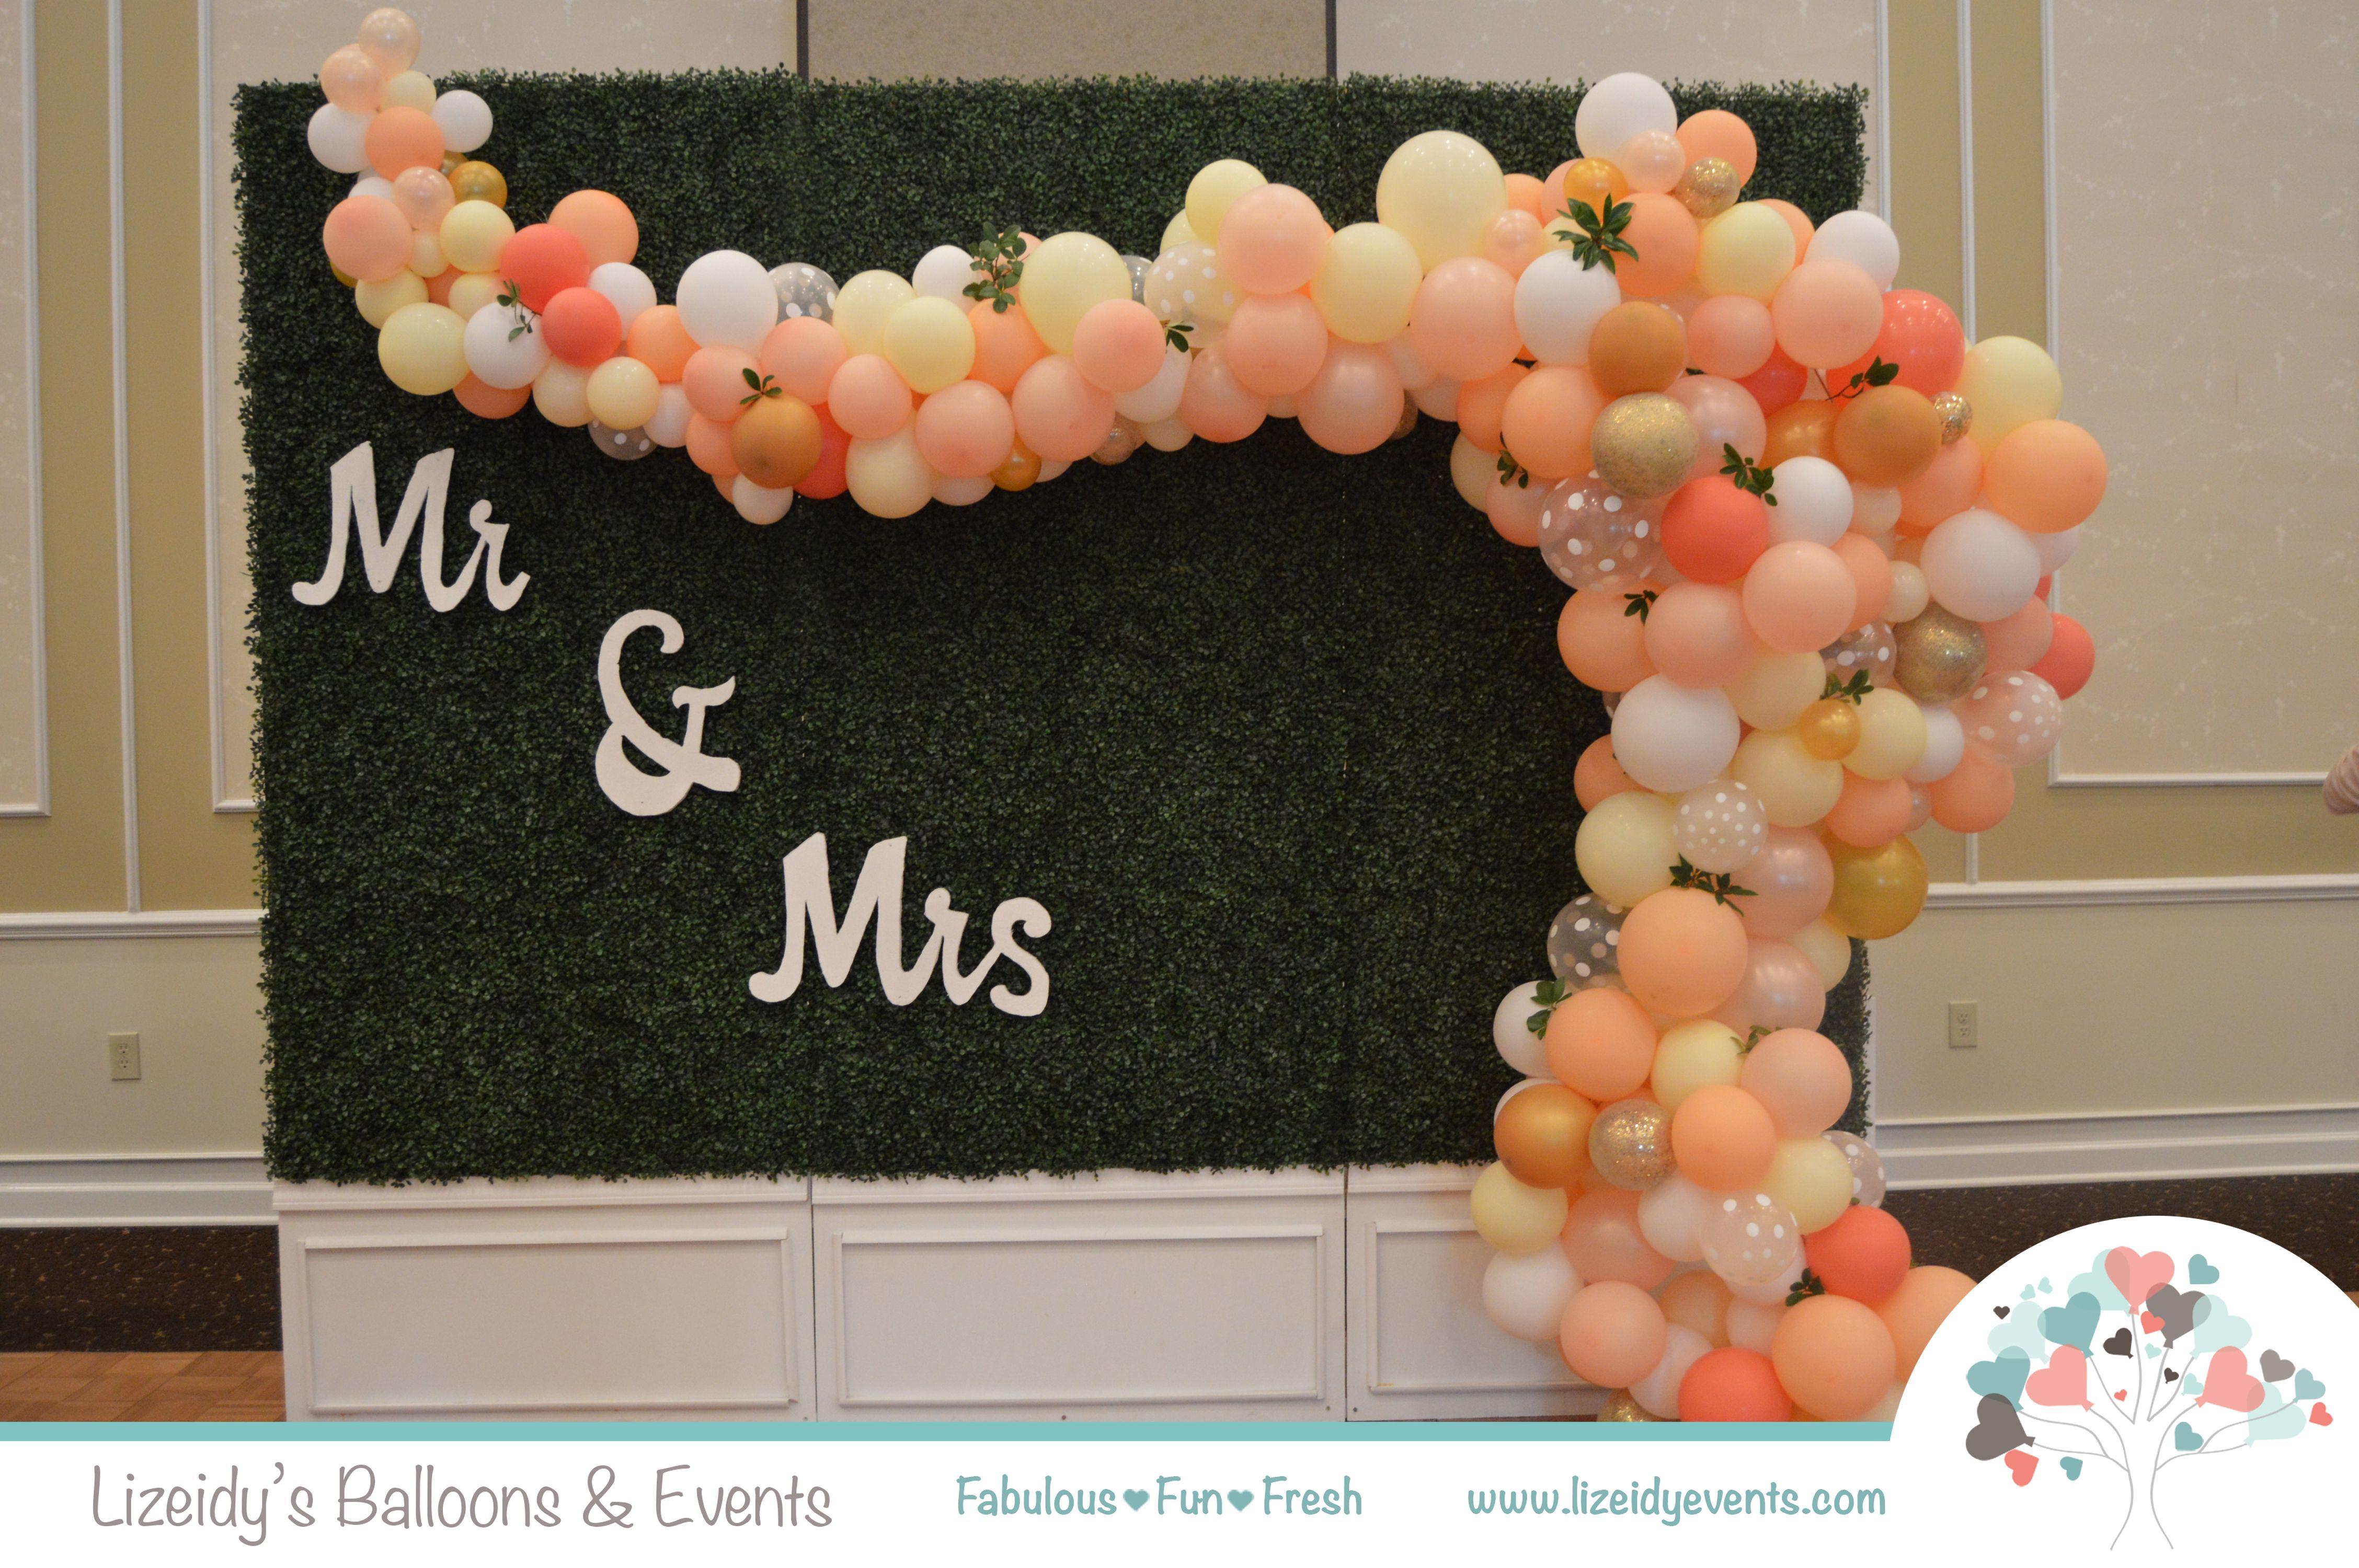 Wedding Backdrop Wedding Balloon Decor Organic Balloon Decor Wedding Balloon Decorations Wedding Balloons Balloon Decorations